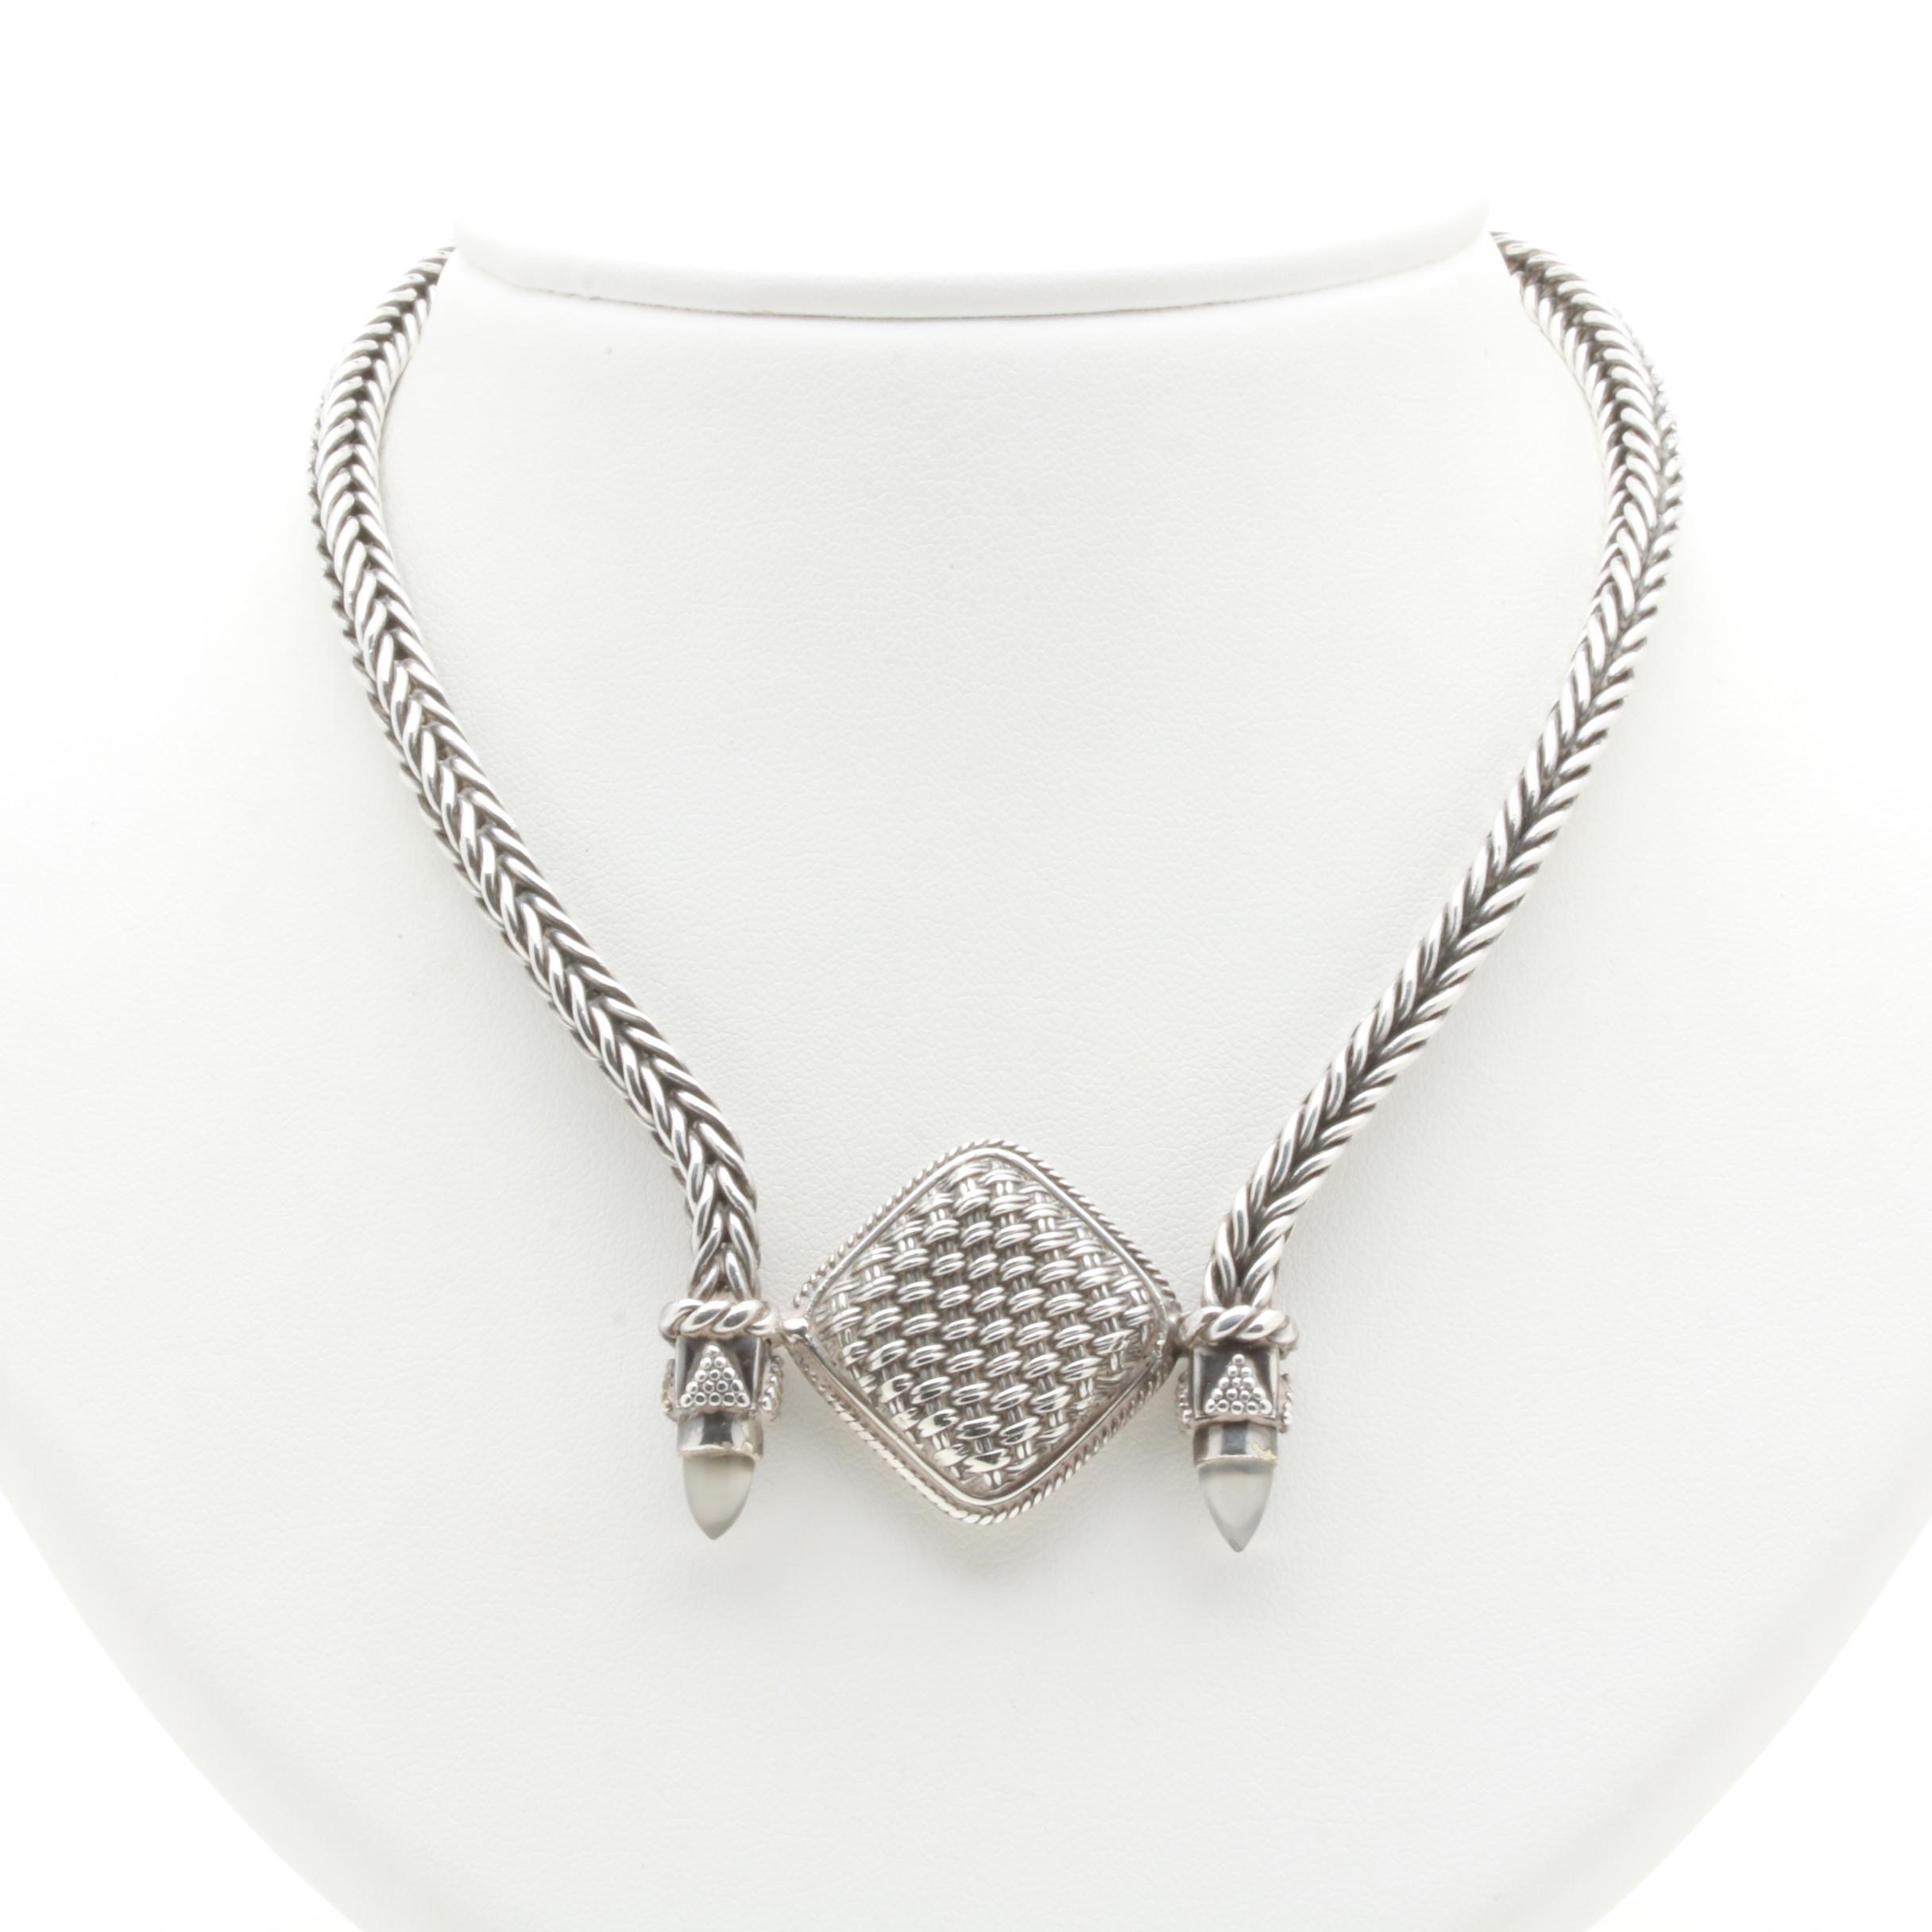 Lori Bonn Sterling Silver Textured Pendant Necklace with Labradorite